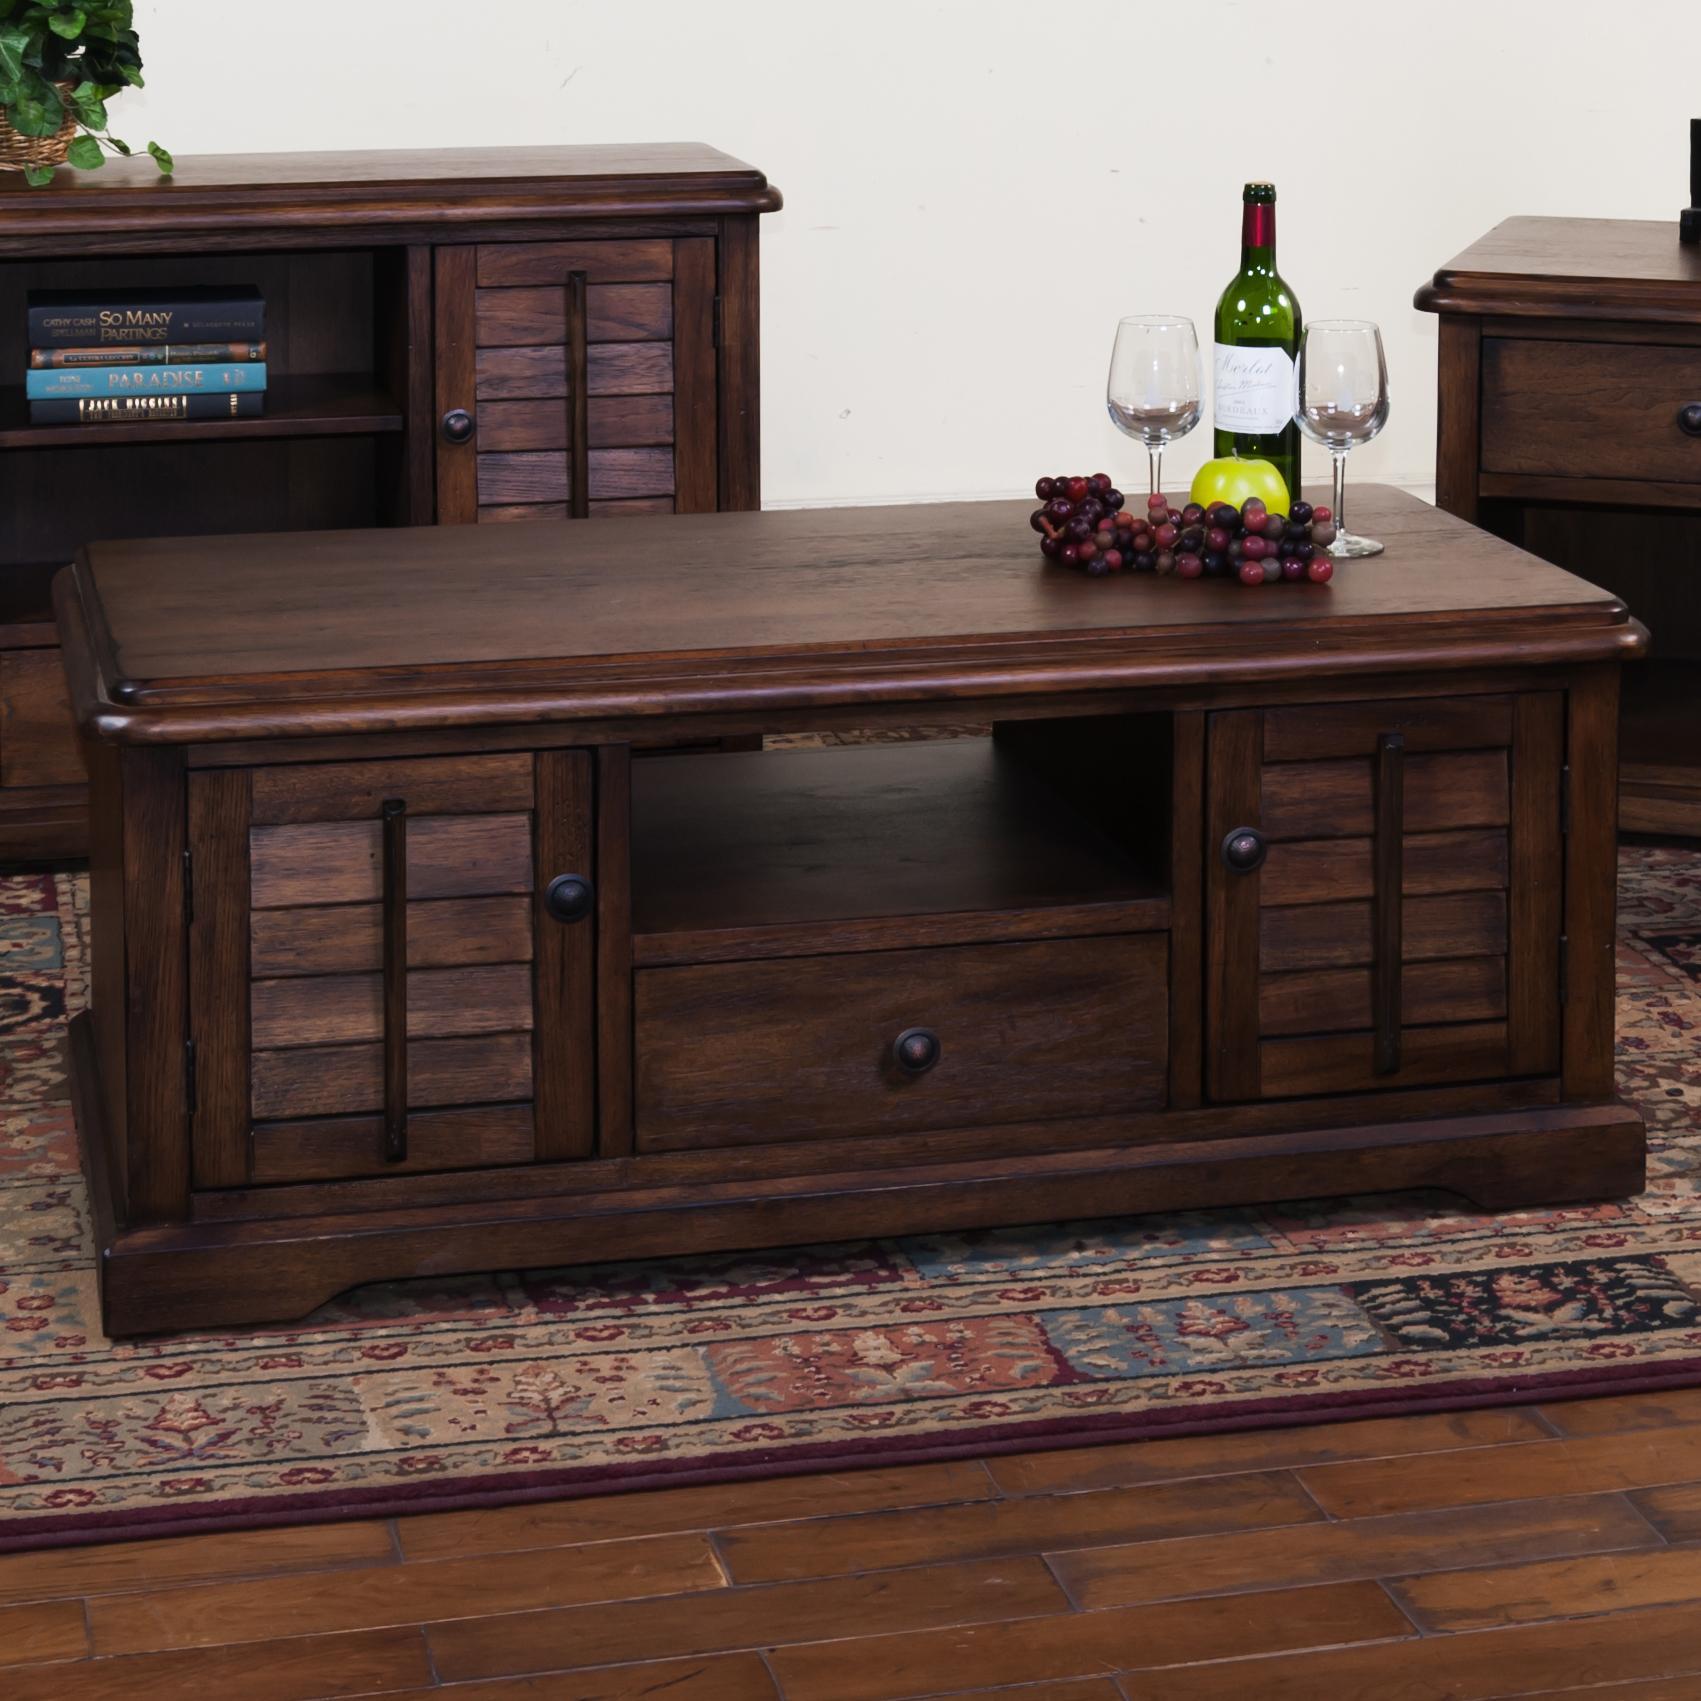 Sunny Designs Savannah Coffee Table - Item Number: 3231AC-C